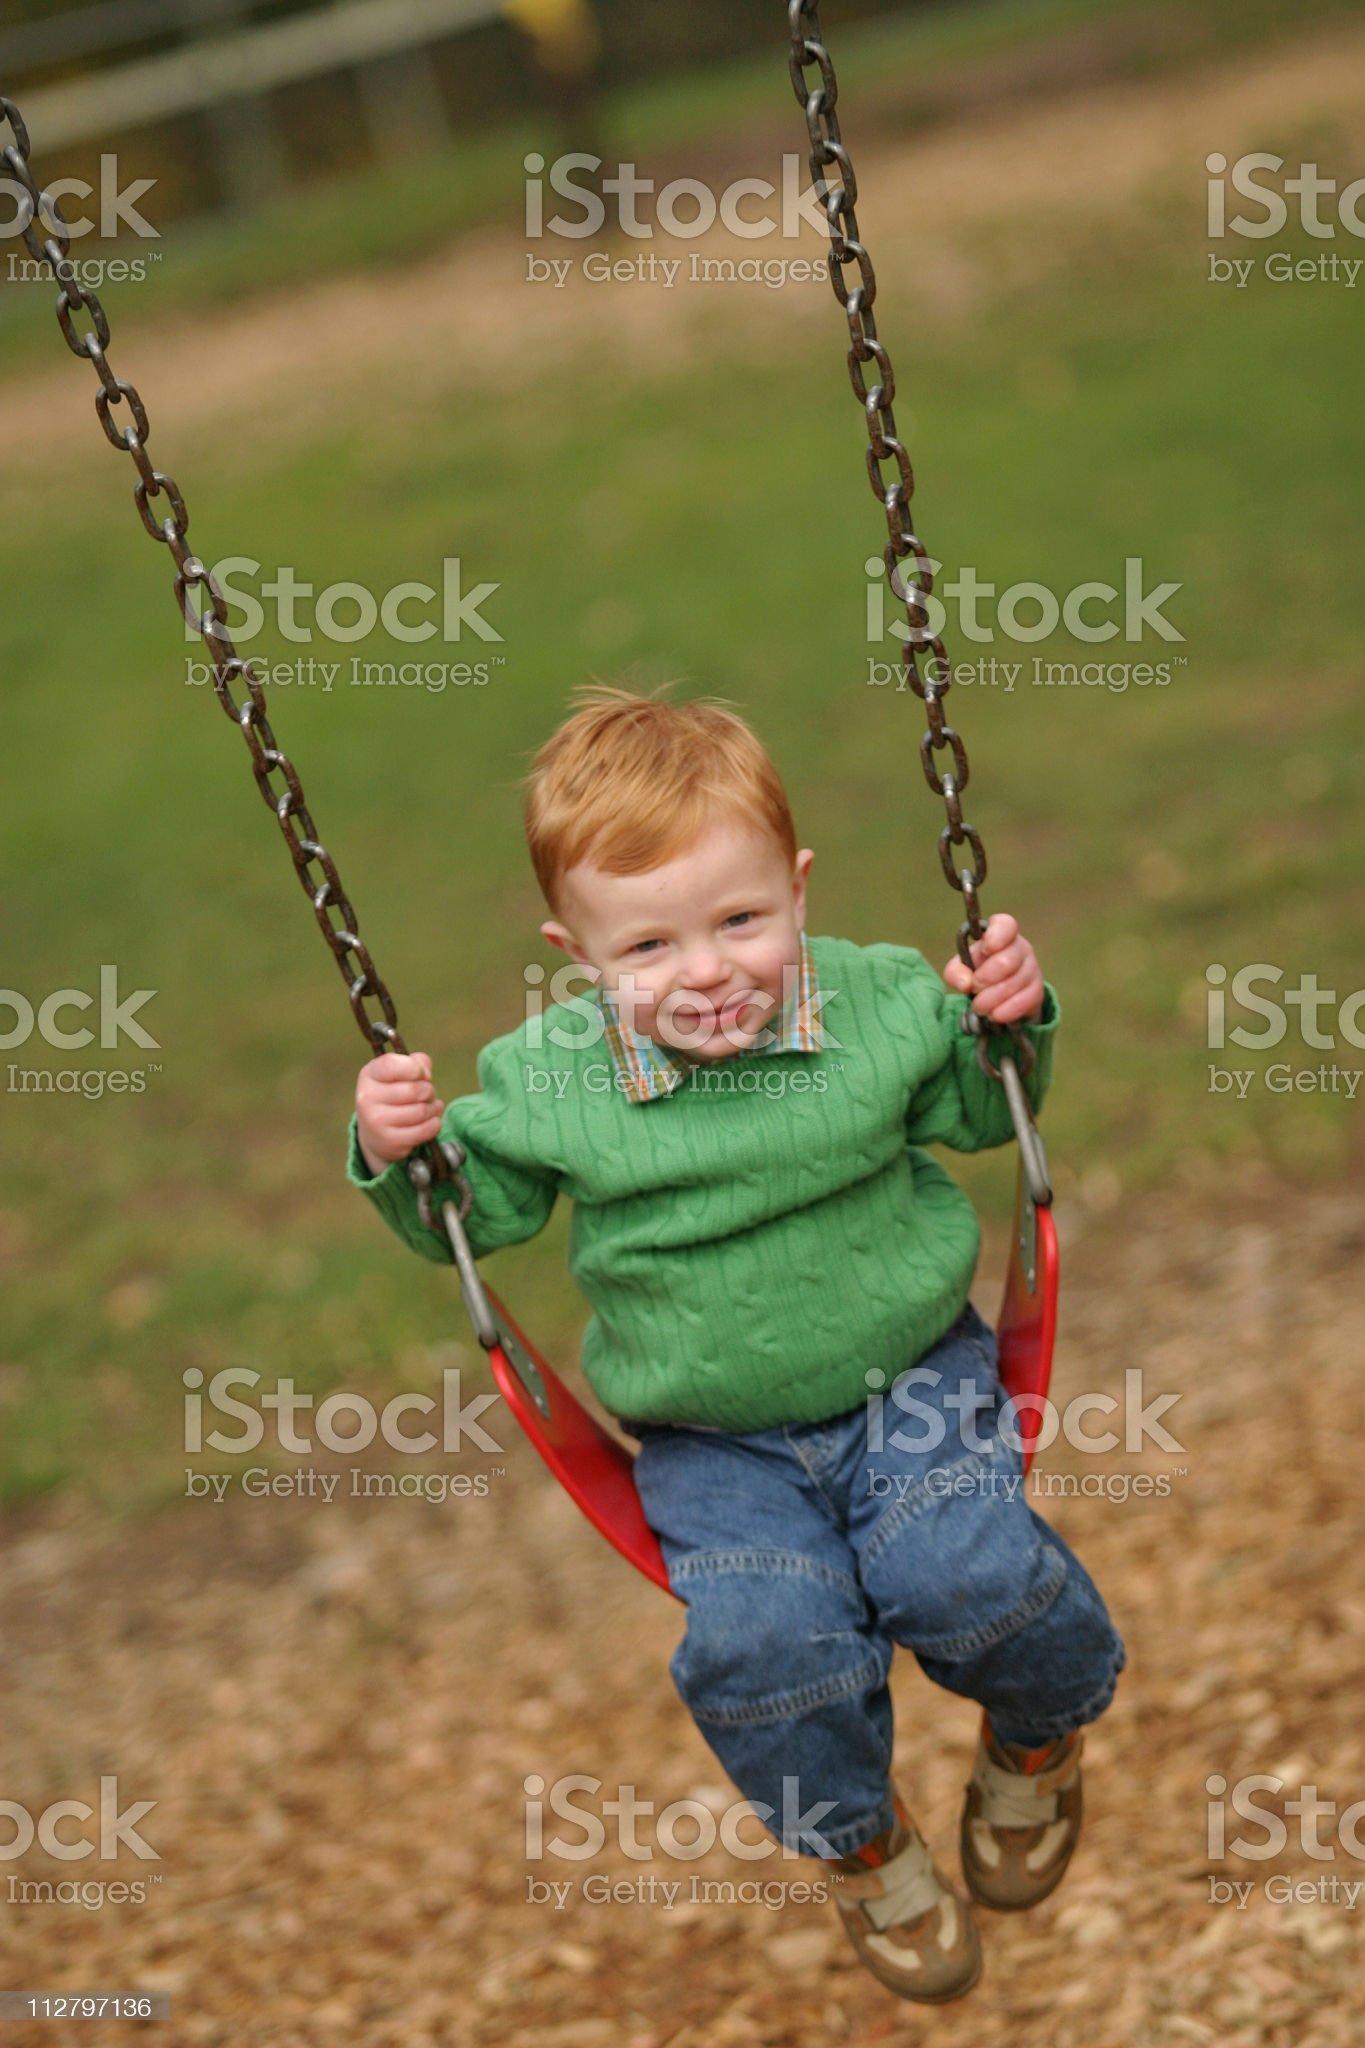 Toddler on swing - 1 royalty-free stock photo